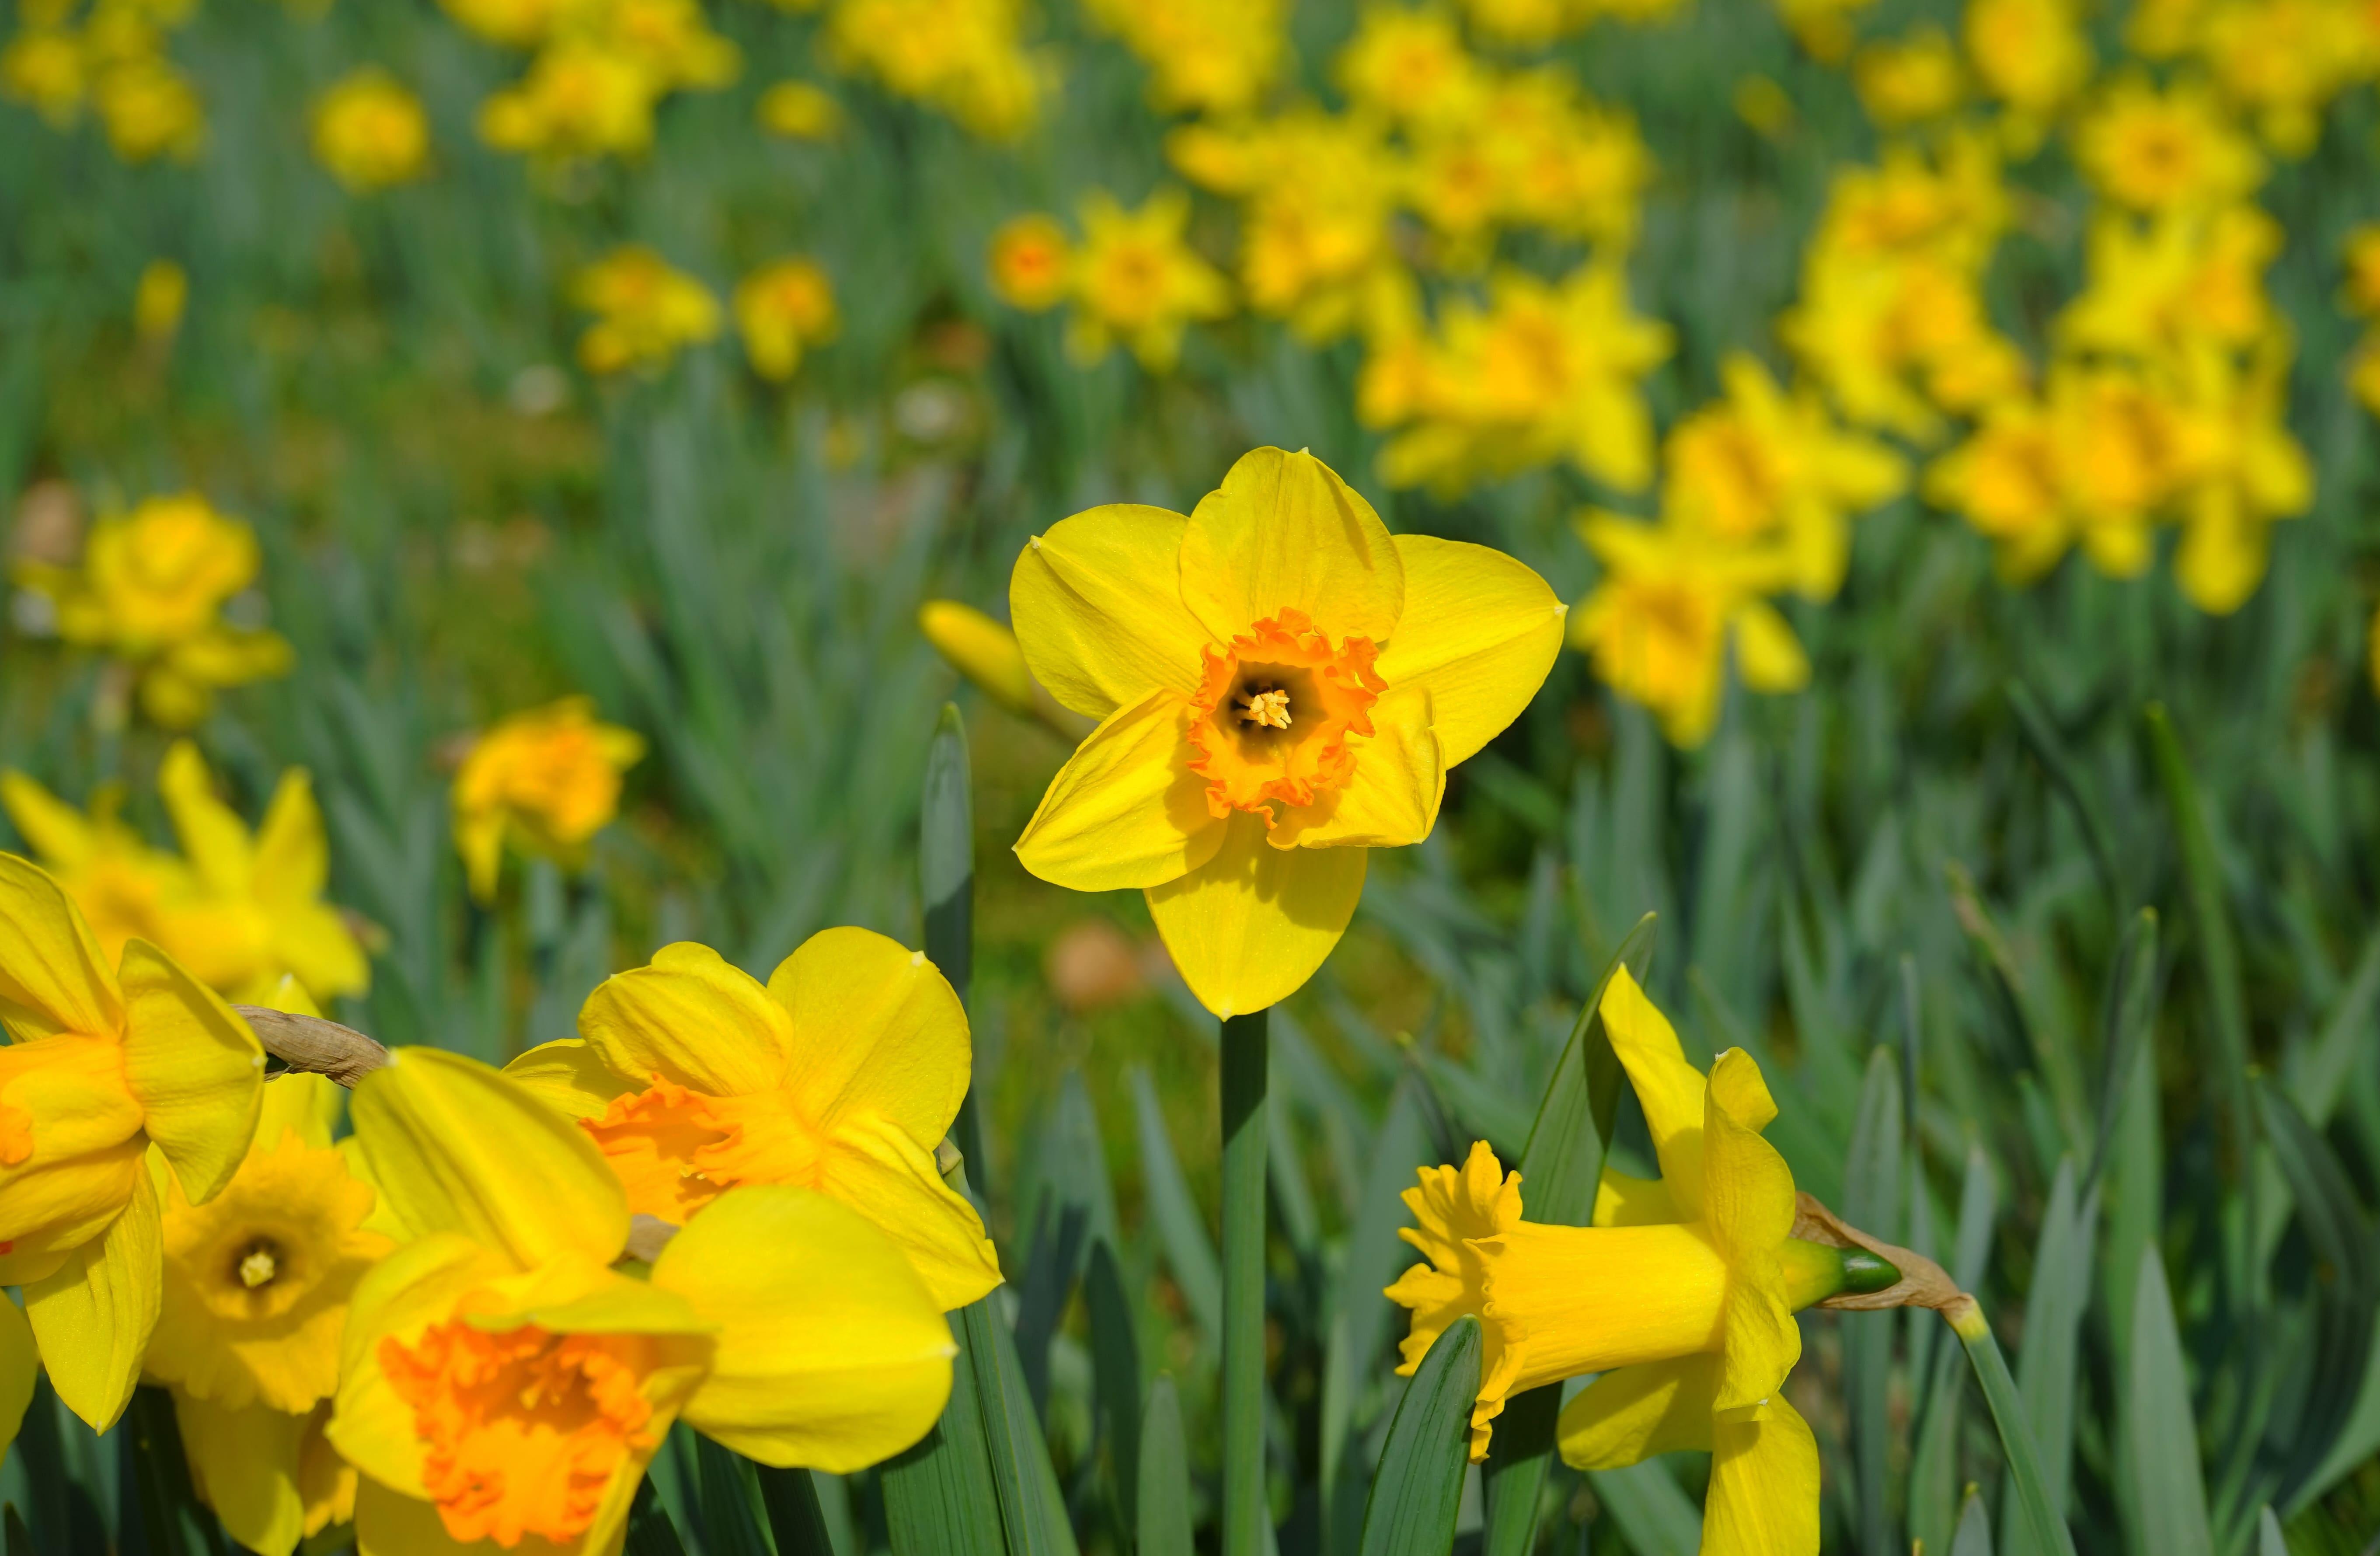 daffodils-photo-15